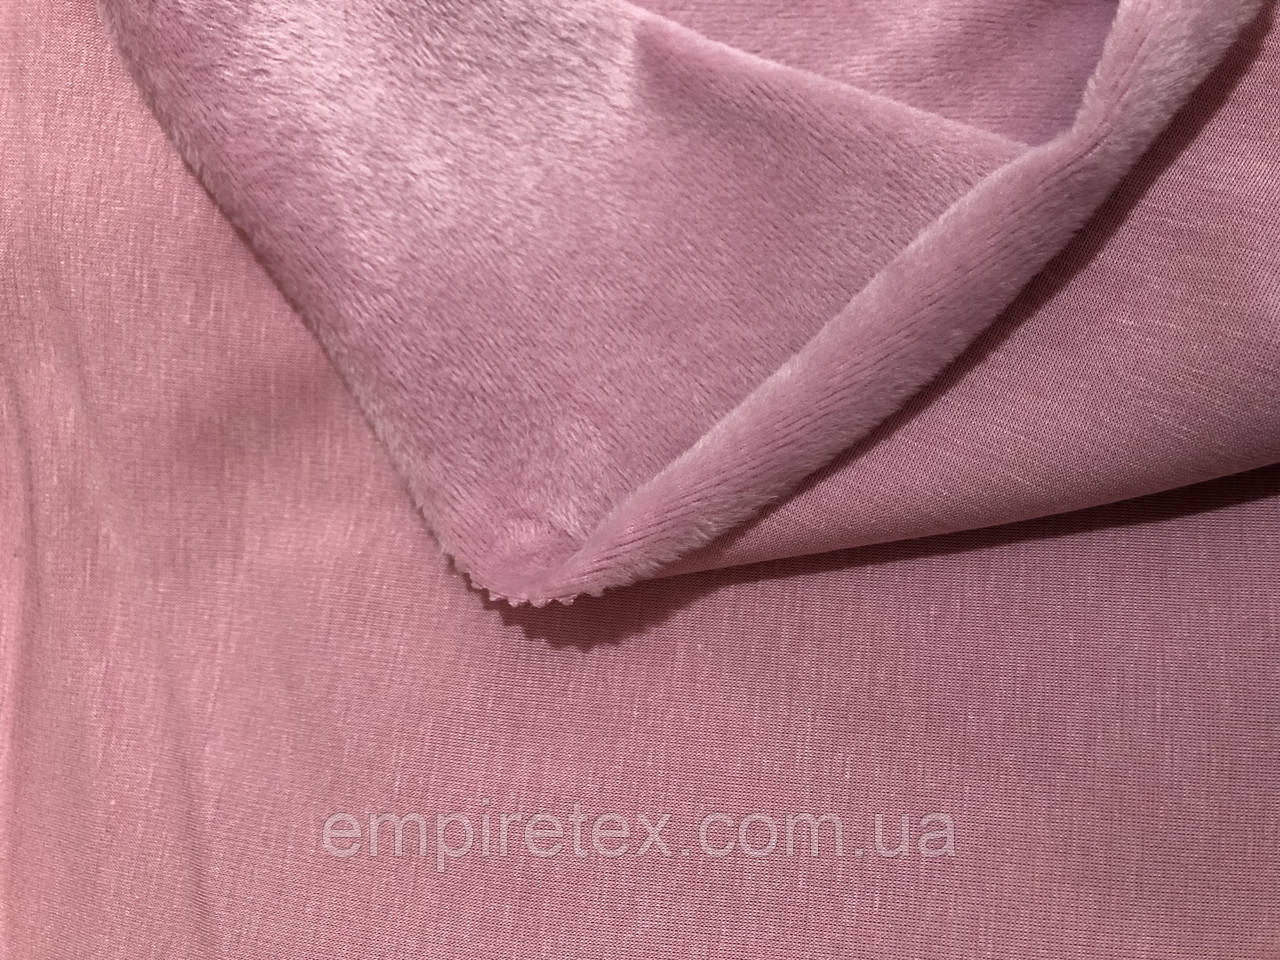 Трехнитка на Меху Розовая